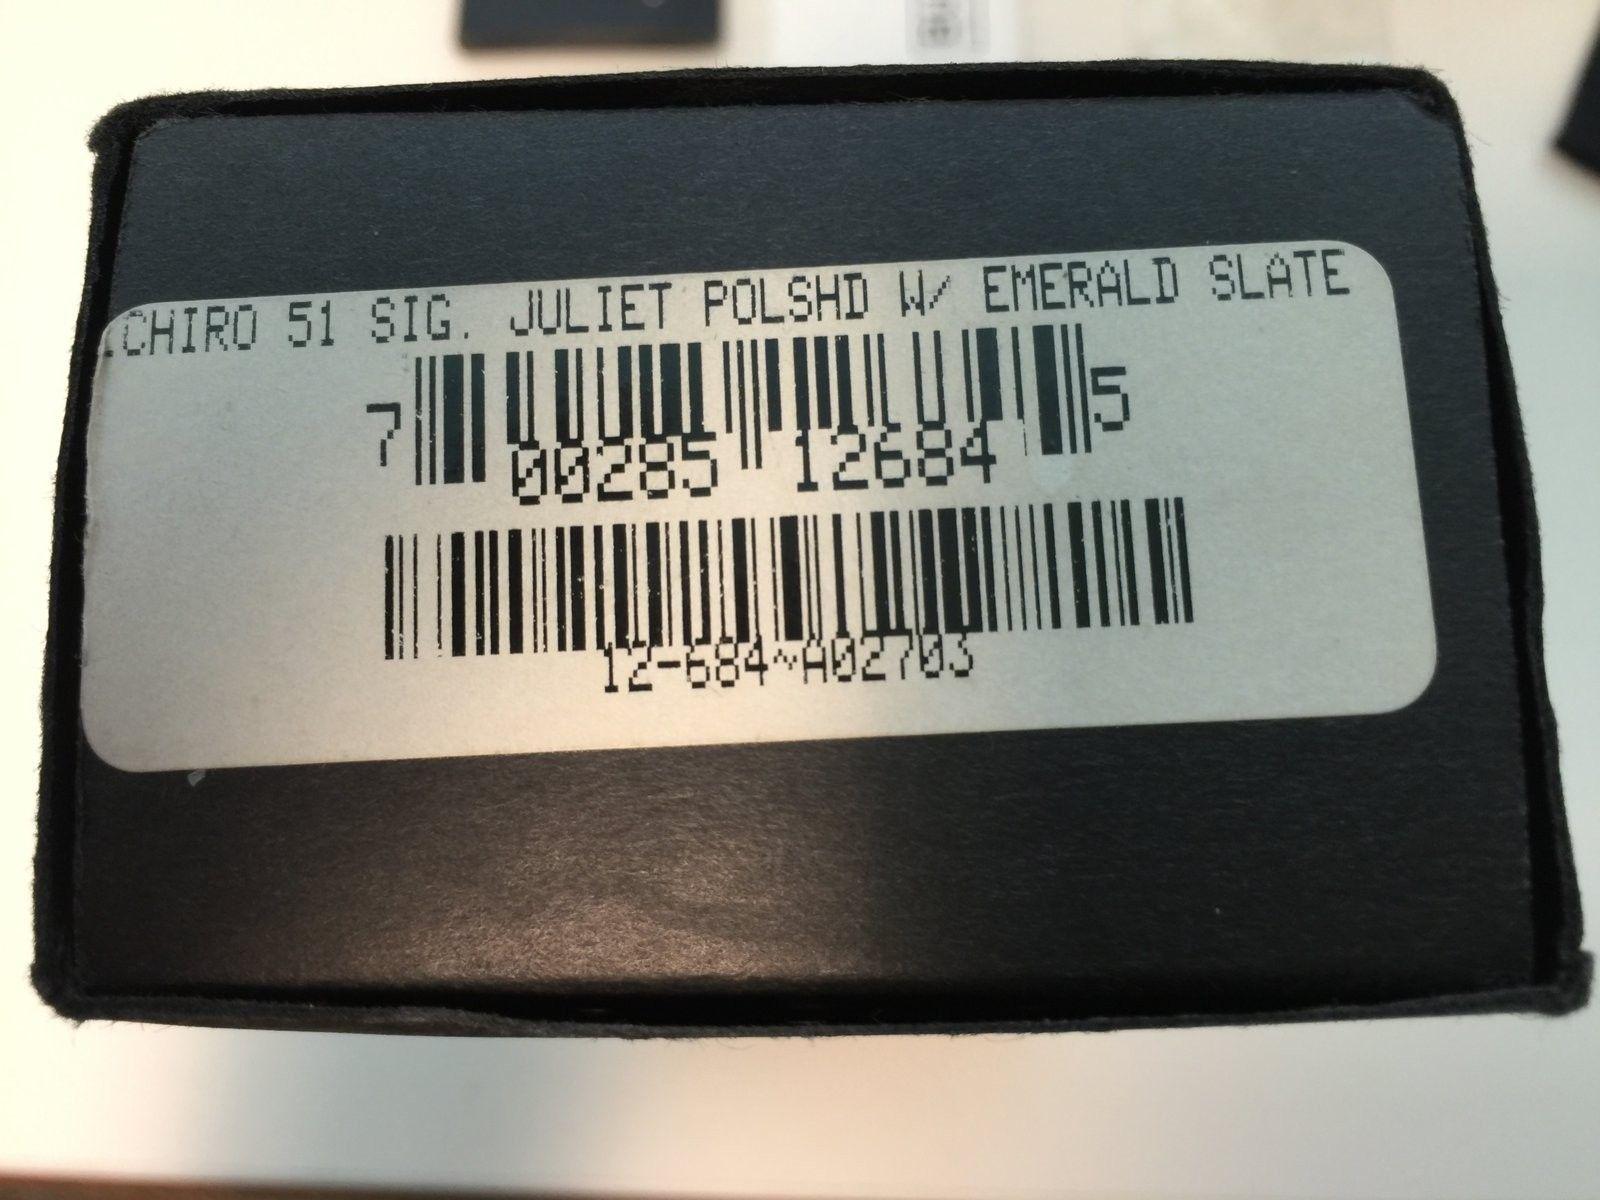 Polished /Emerald Slate Ichiro Juliet [US release, non-serial] - IMG_4482.JPG